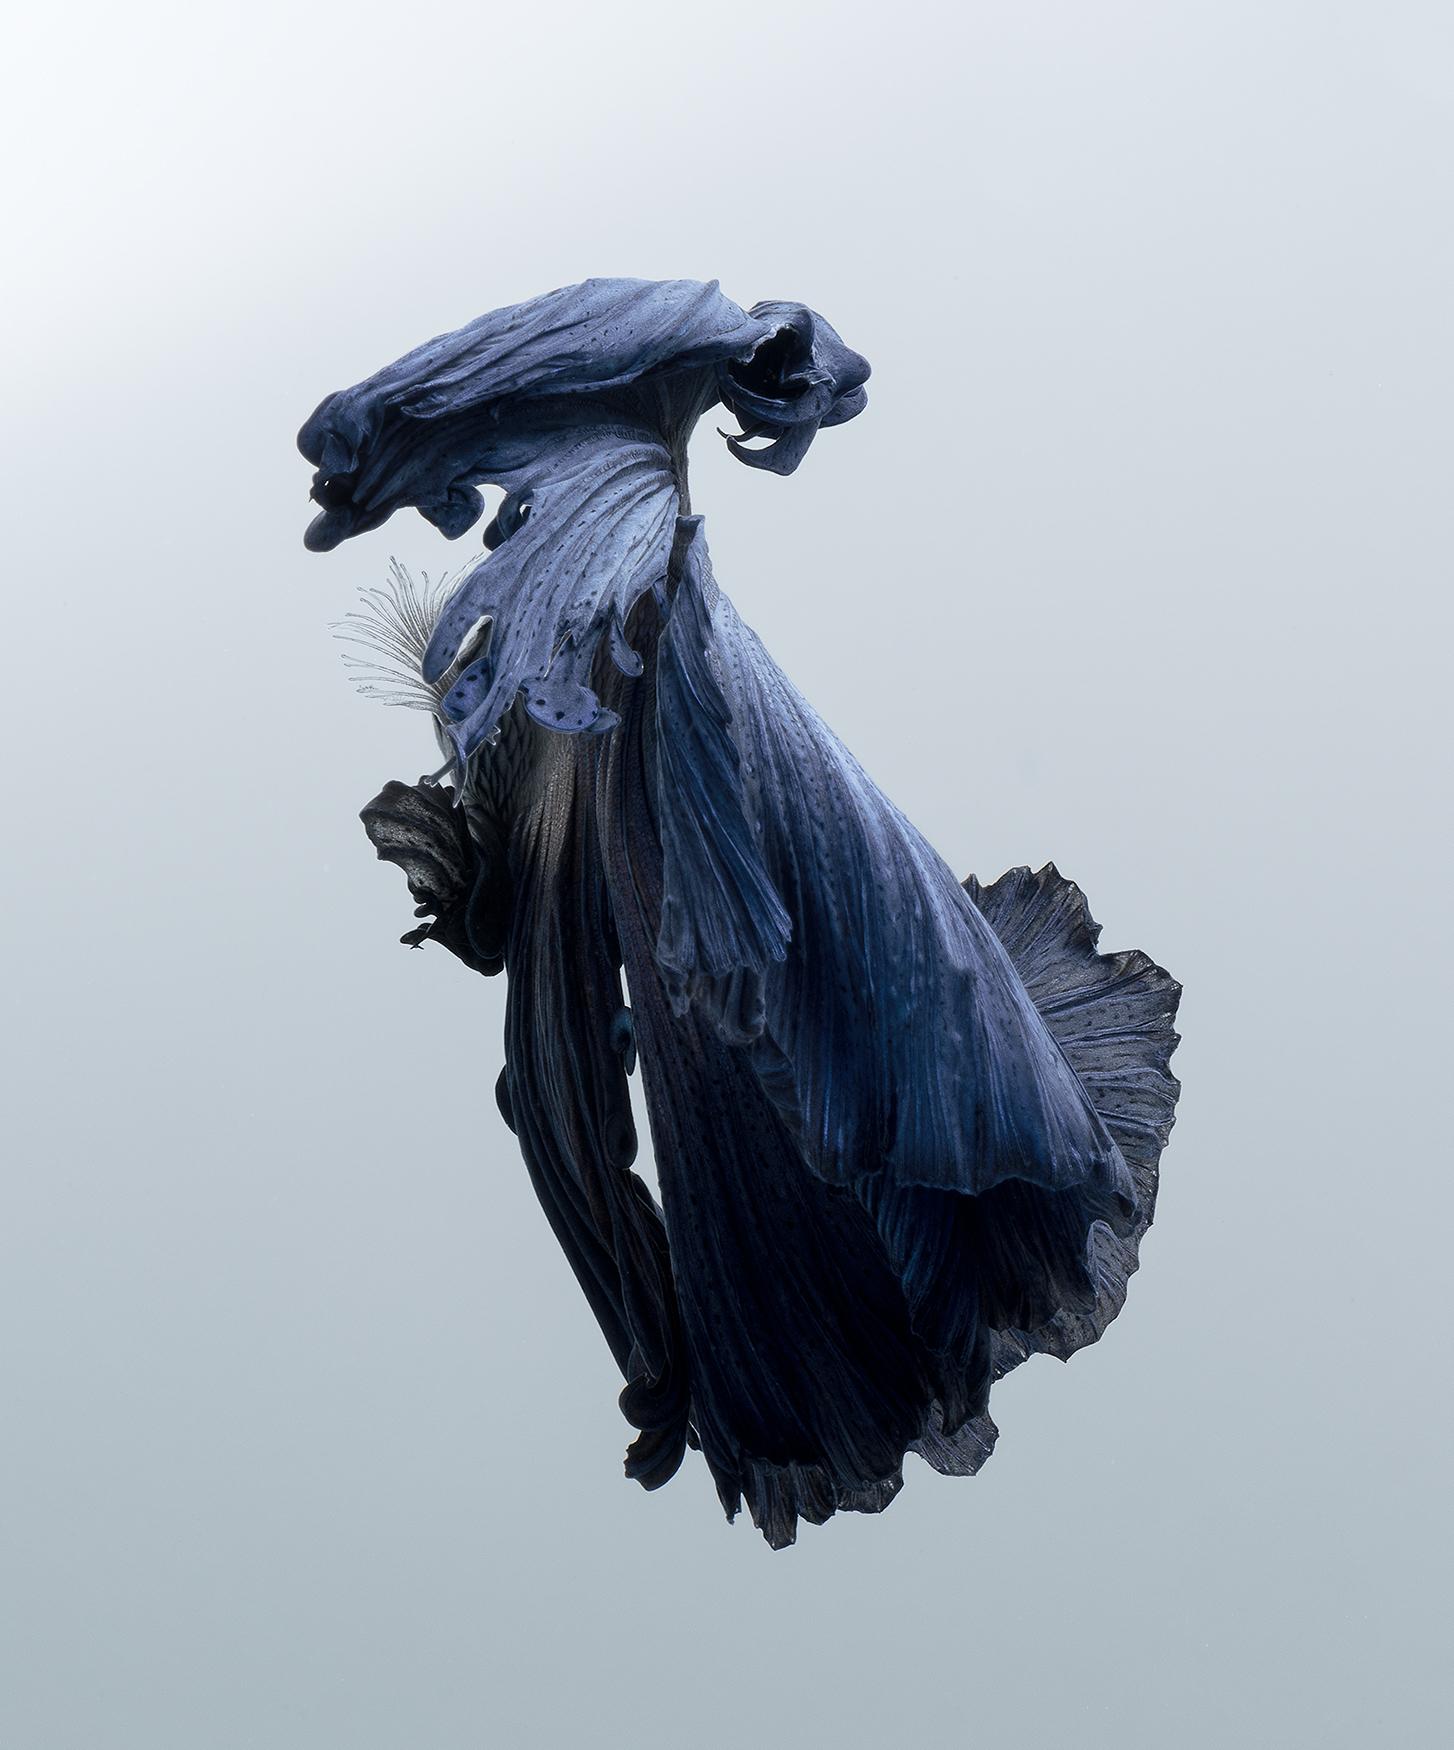 Betta Fish Imitate Elegantly Posed Dancers in New Portraits by Visarute Angkatavanich